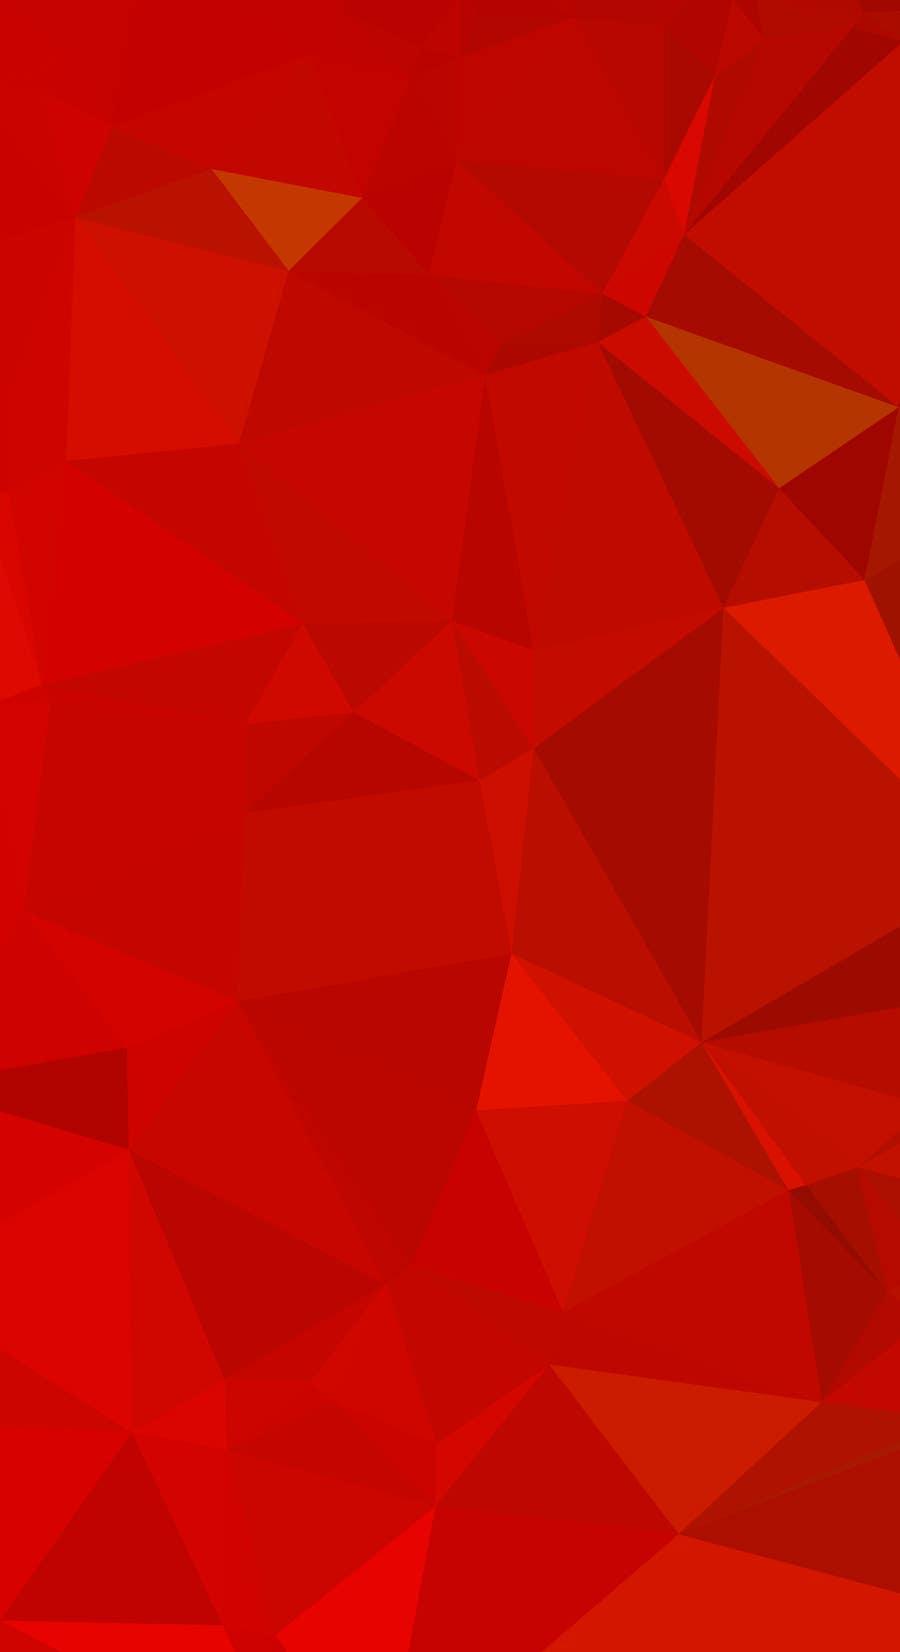 Konkurrenceindlæg #                                        18                                      for                                         Background image: graphic/geometric design needed